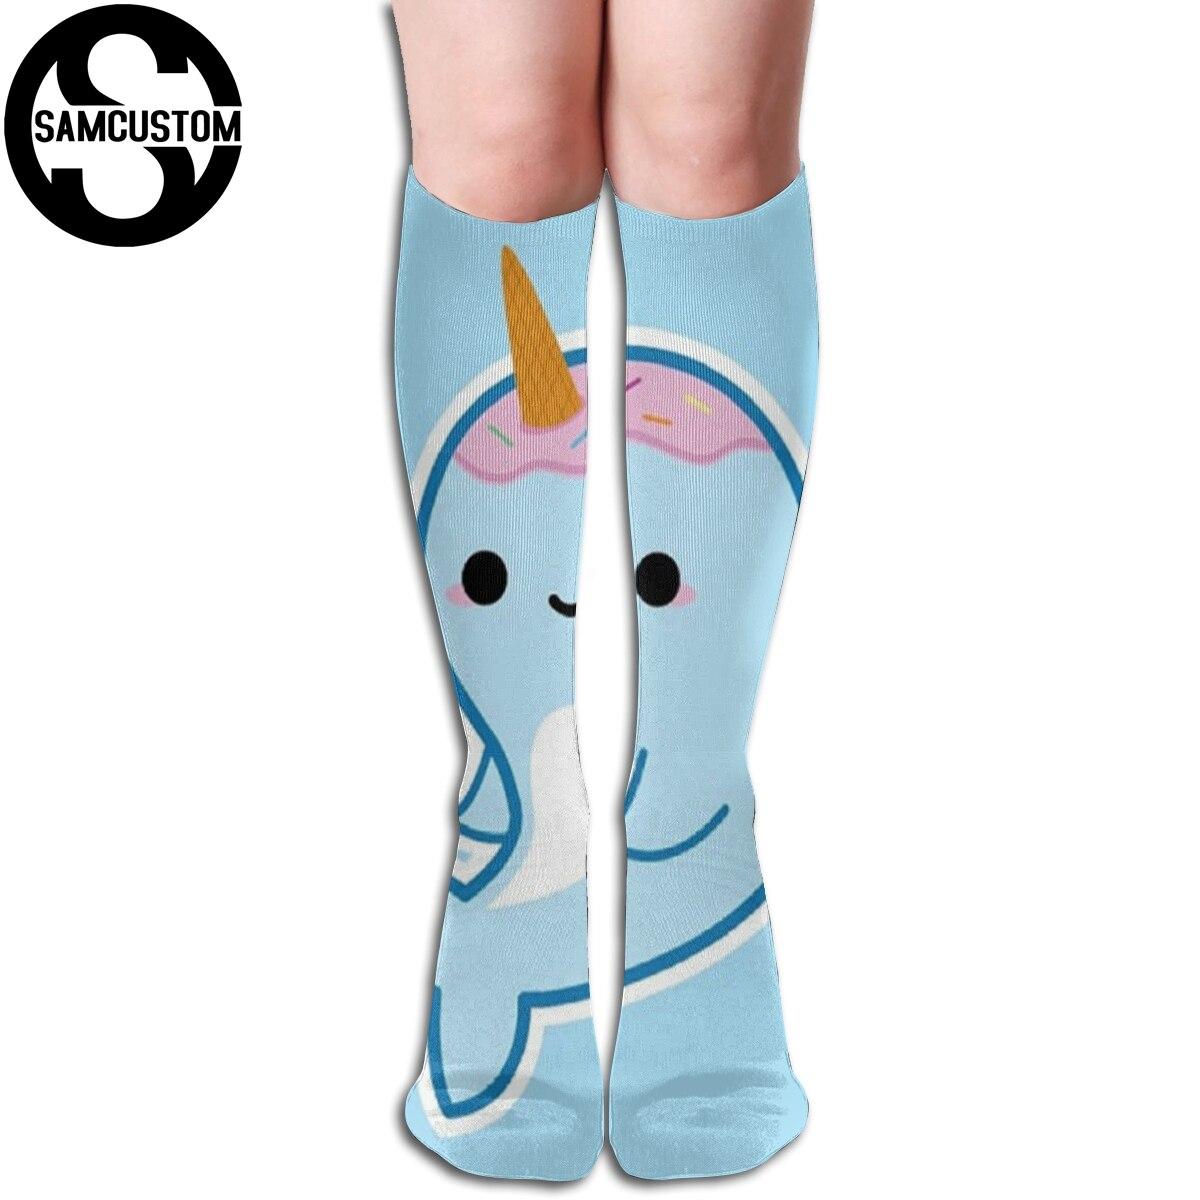 Women's Socks & Hosiery Stockings Samcustom Personalized Custom Narwhal In The Sea 3d Printing Female Kawaii Knee Socks Fashion Girl Cute Stockings Strong Packing